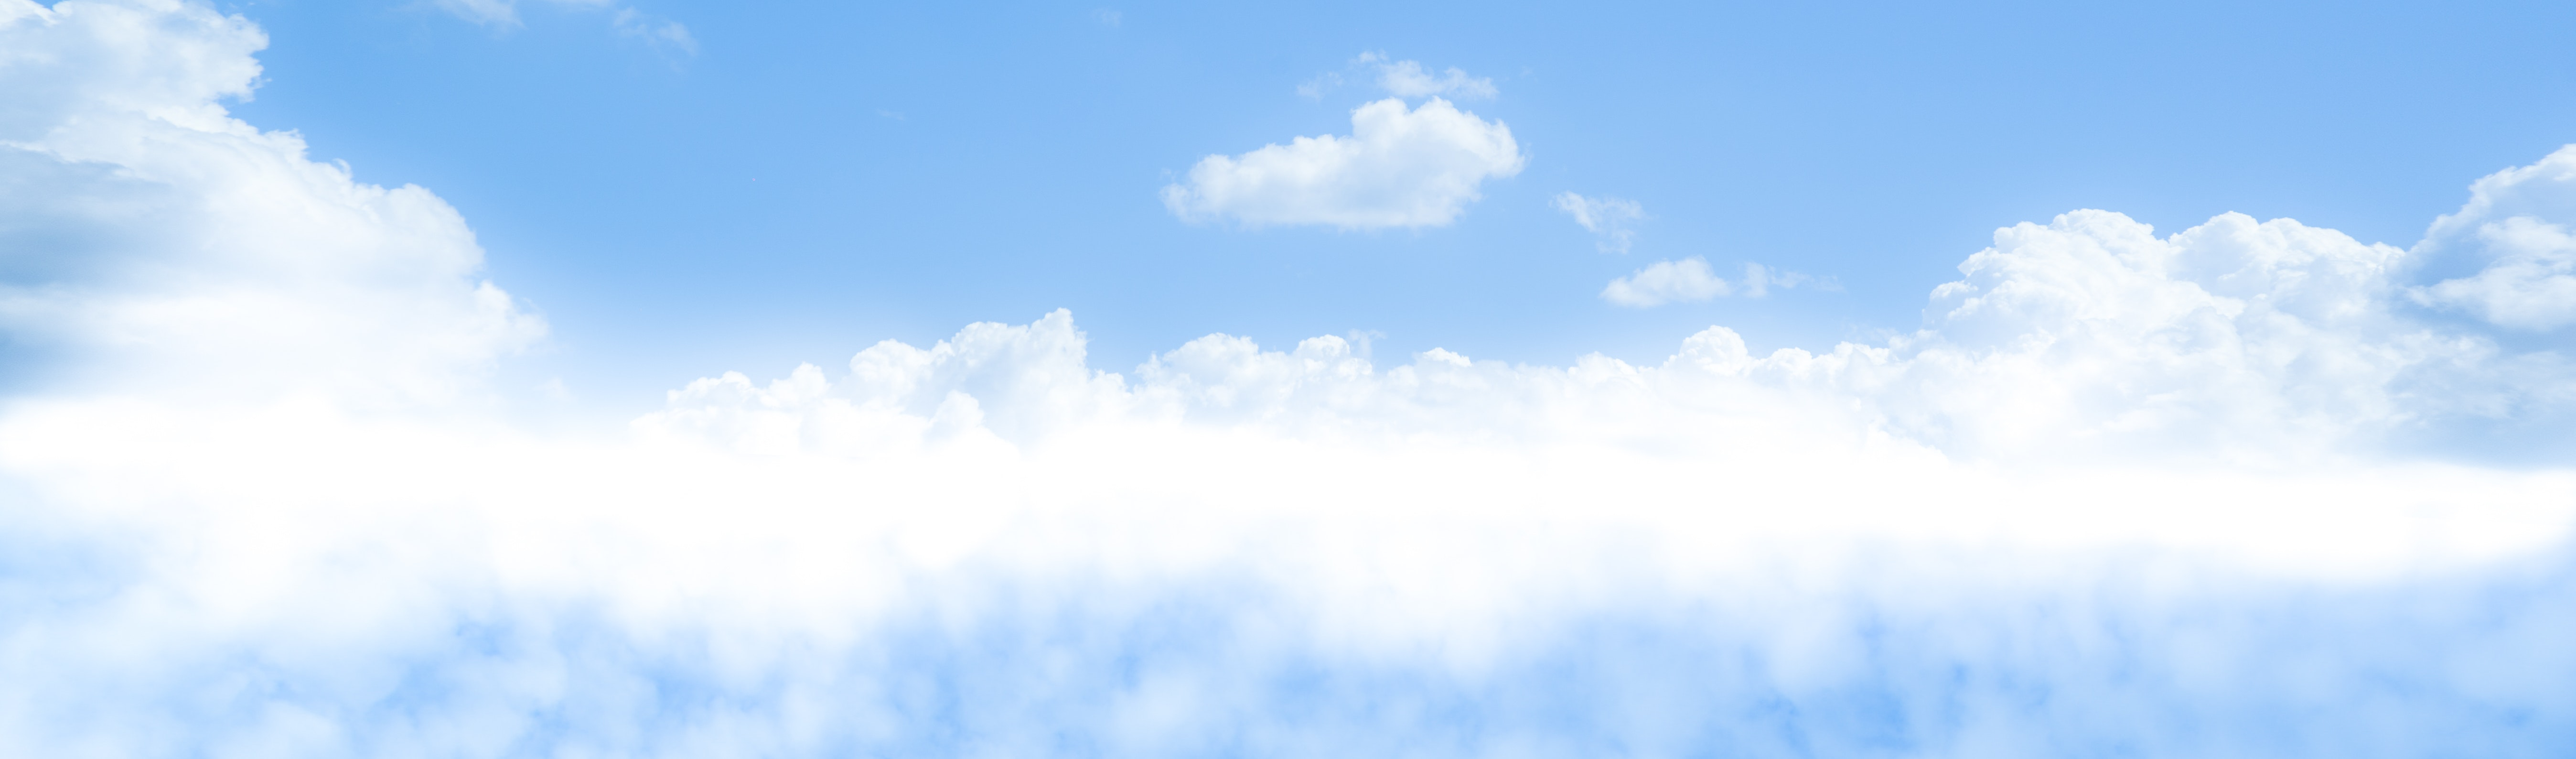 Capítulo 1 - Harabeoji - Página 2 Ceu-azul-nuvens7